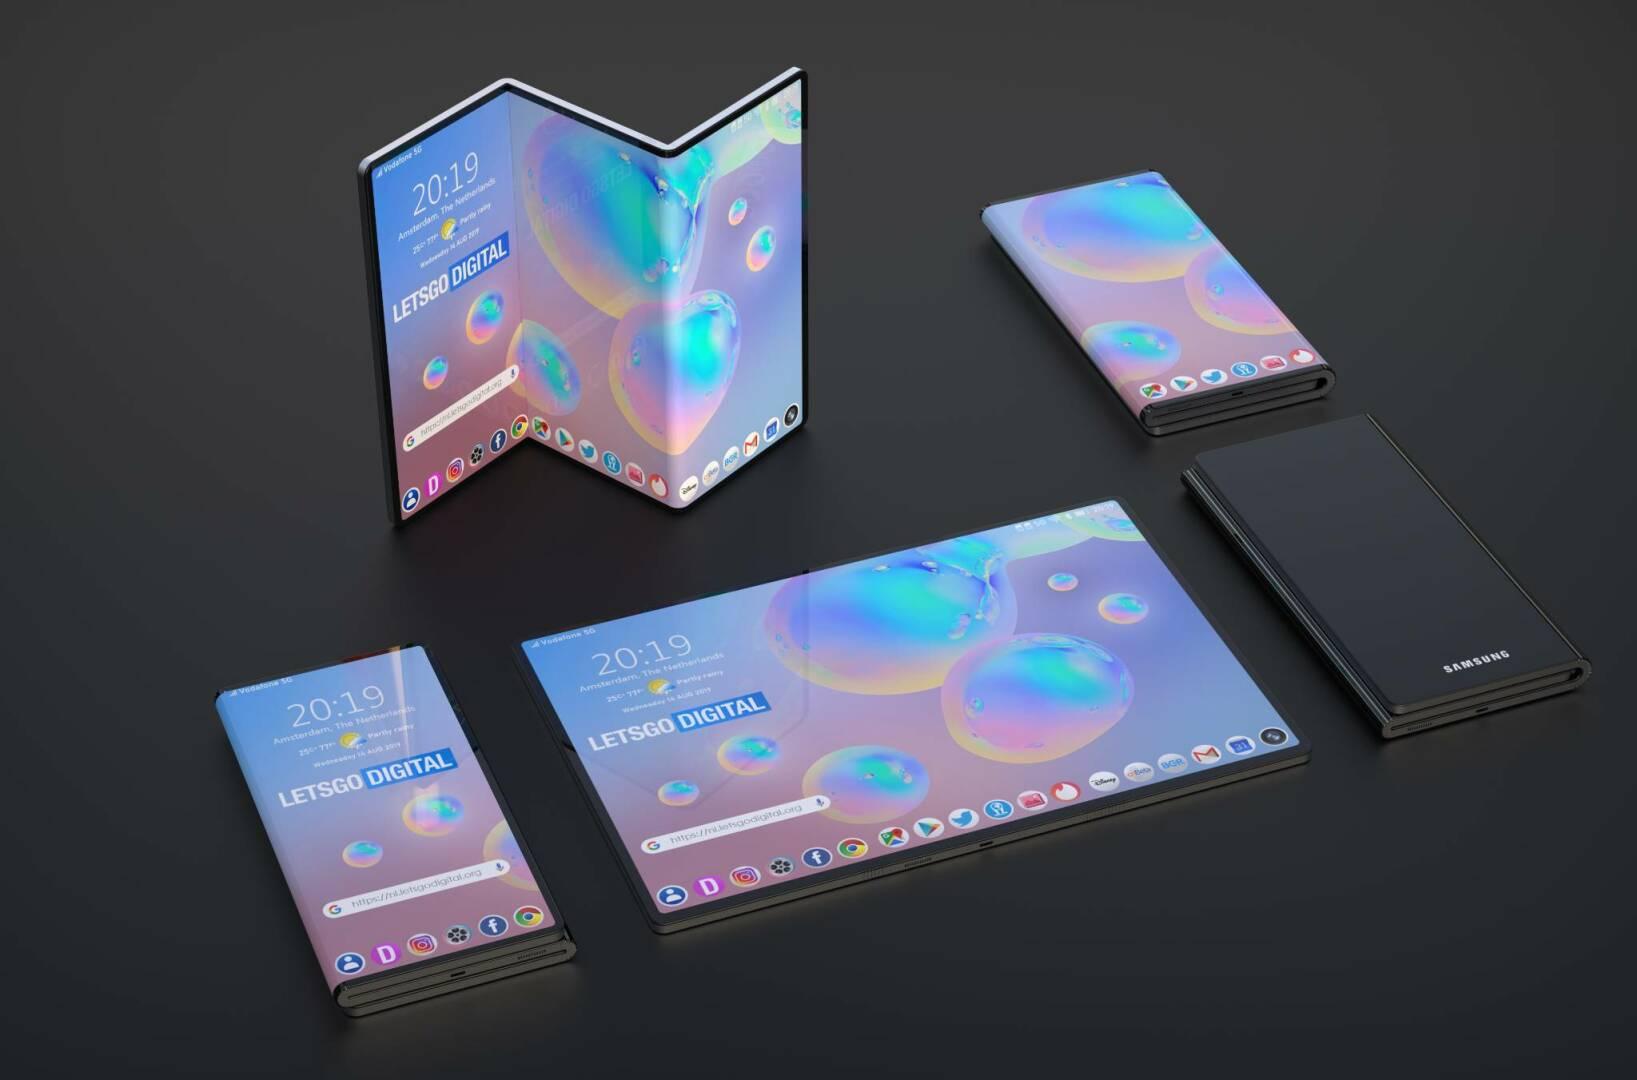 Galaxy Z Fold Lite